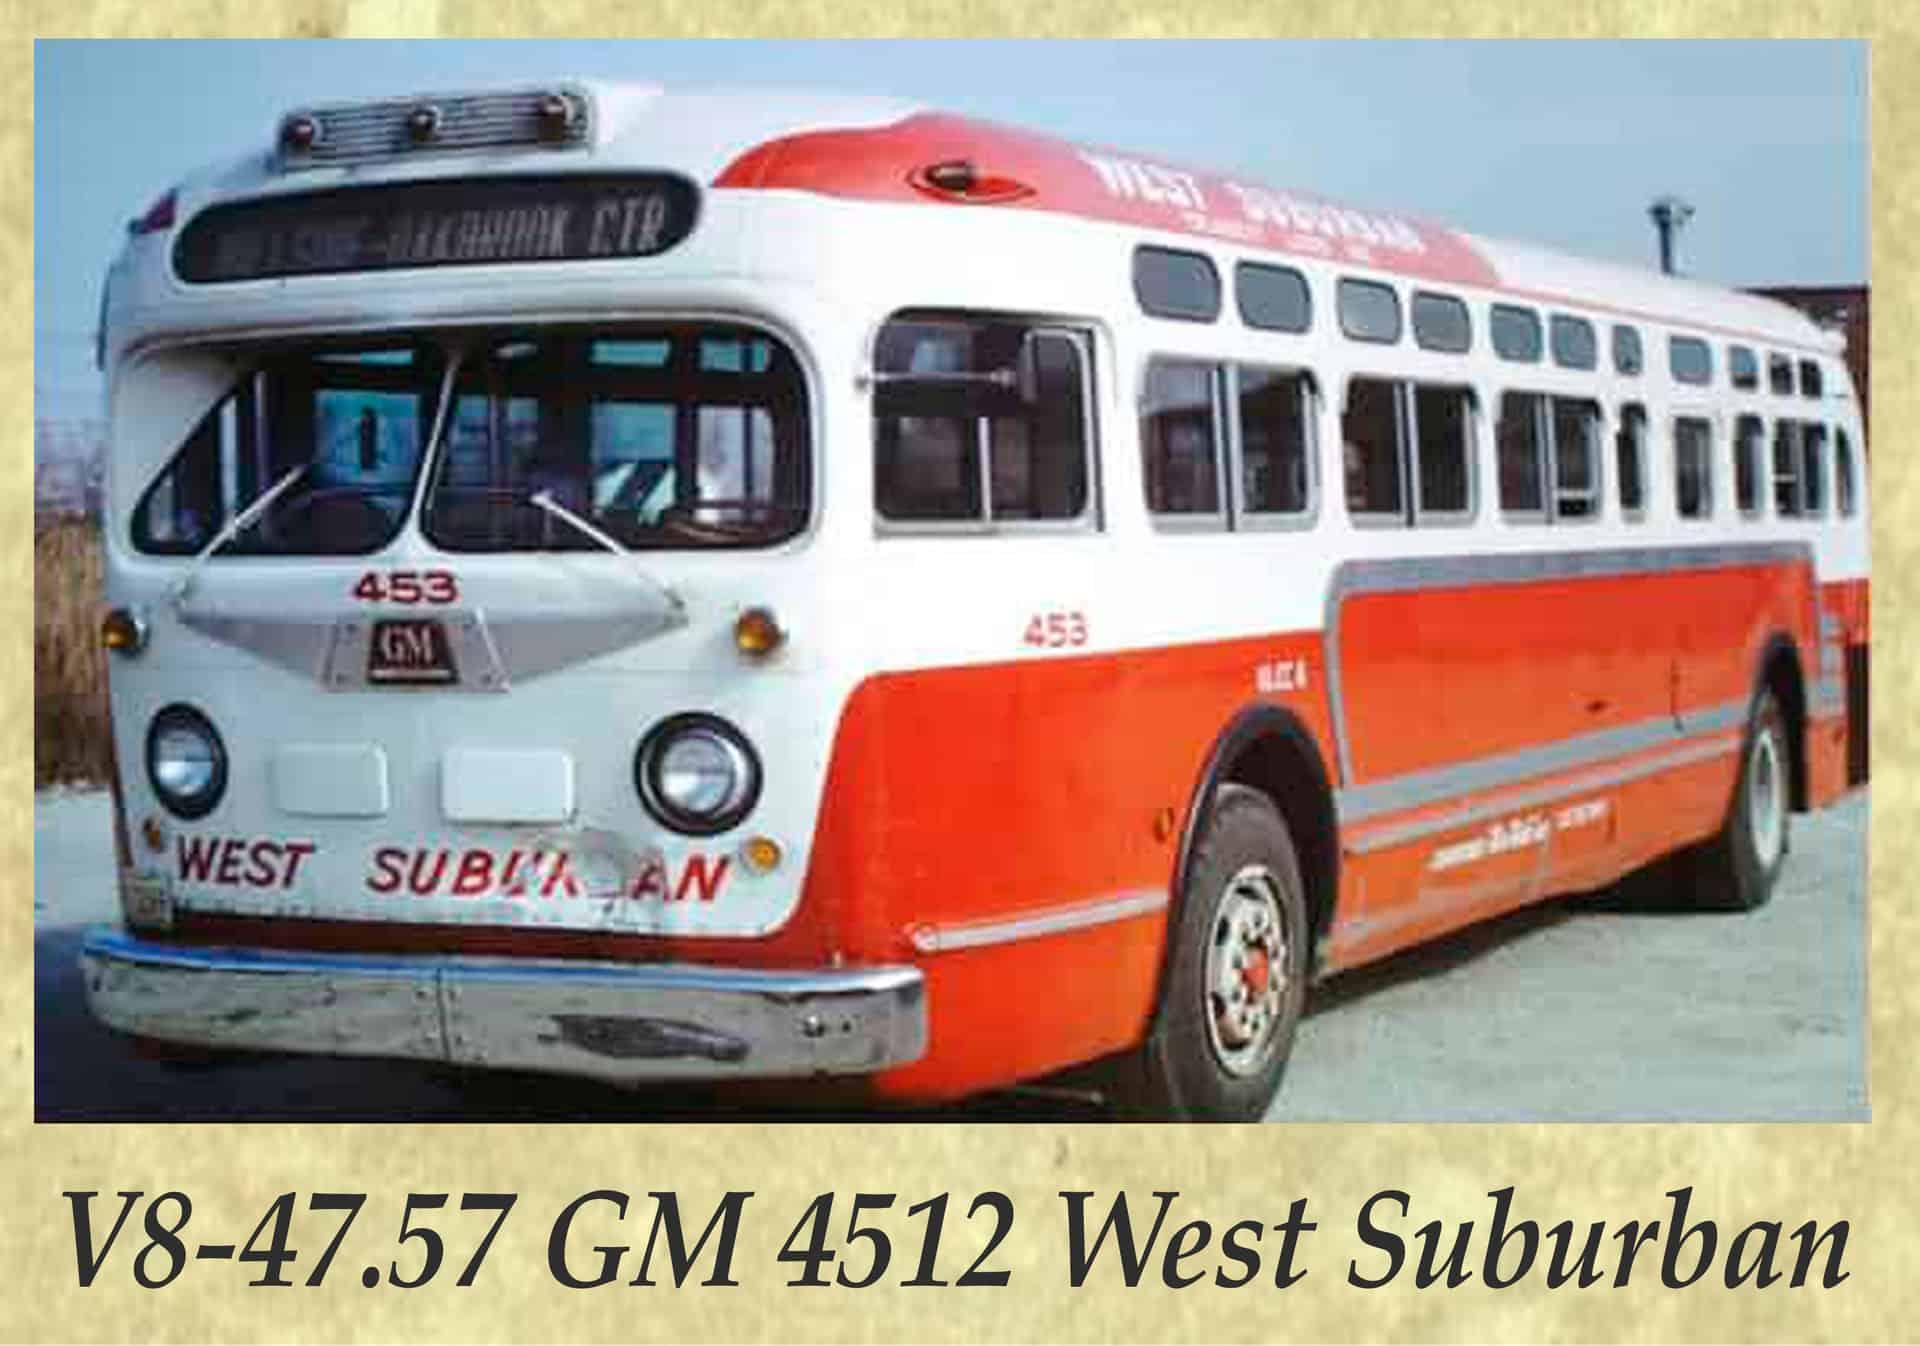 V8-47.57 GM 4512 West Suburban